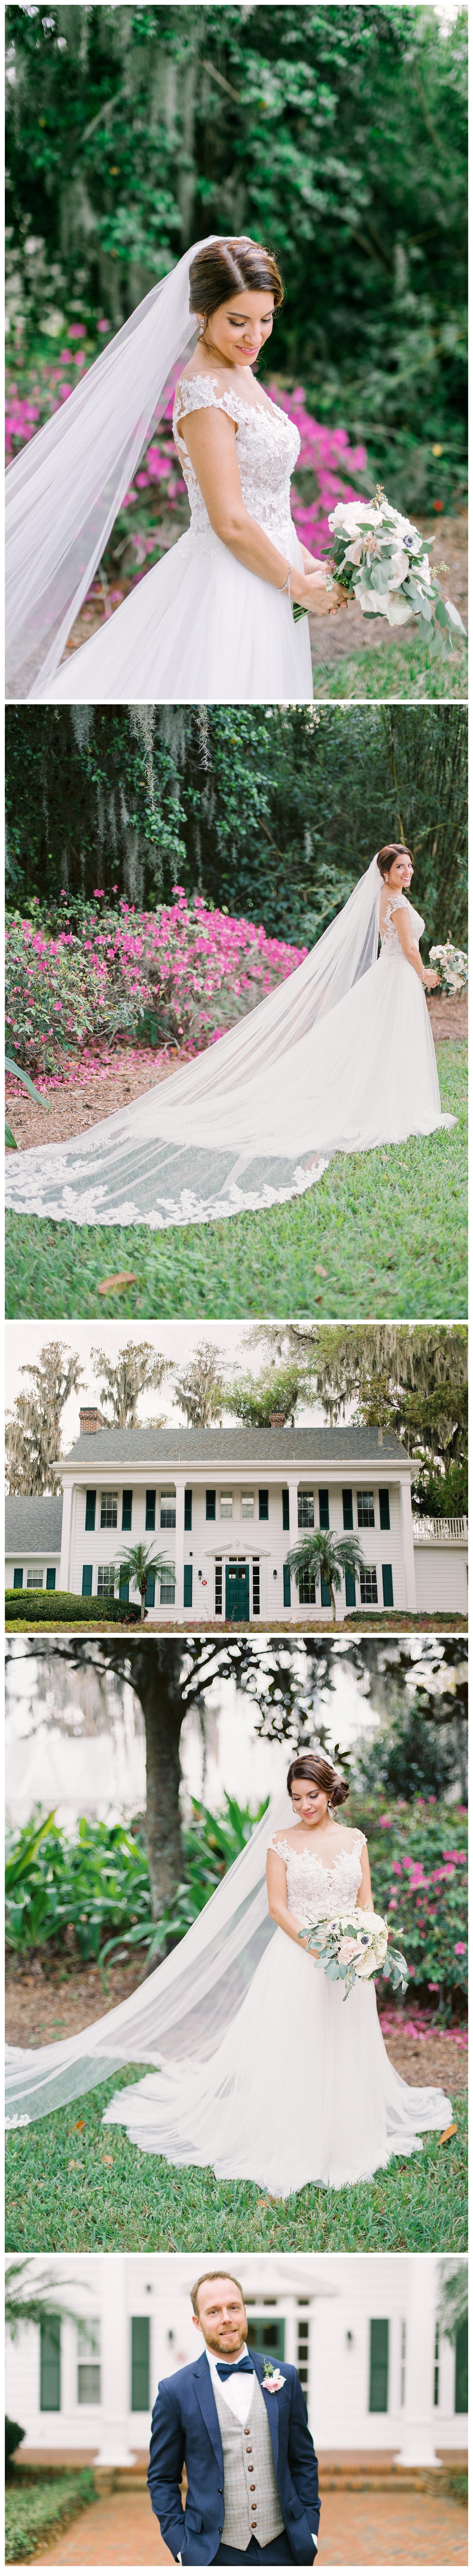 Cypress-Grove-Estate-House-Orlando-FL-Wedding-photos-bride-groom